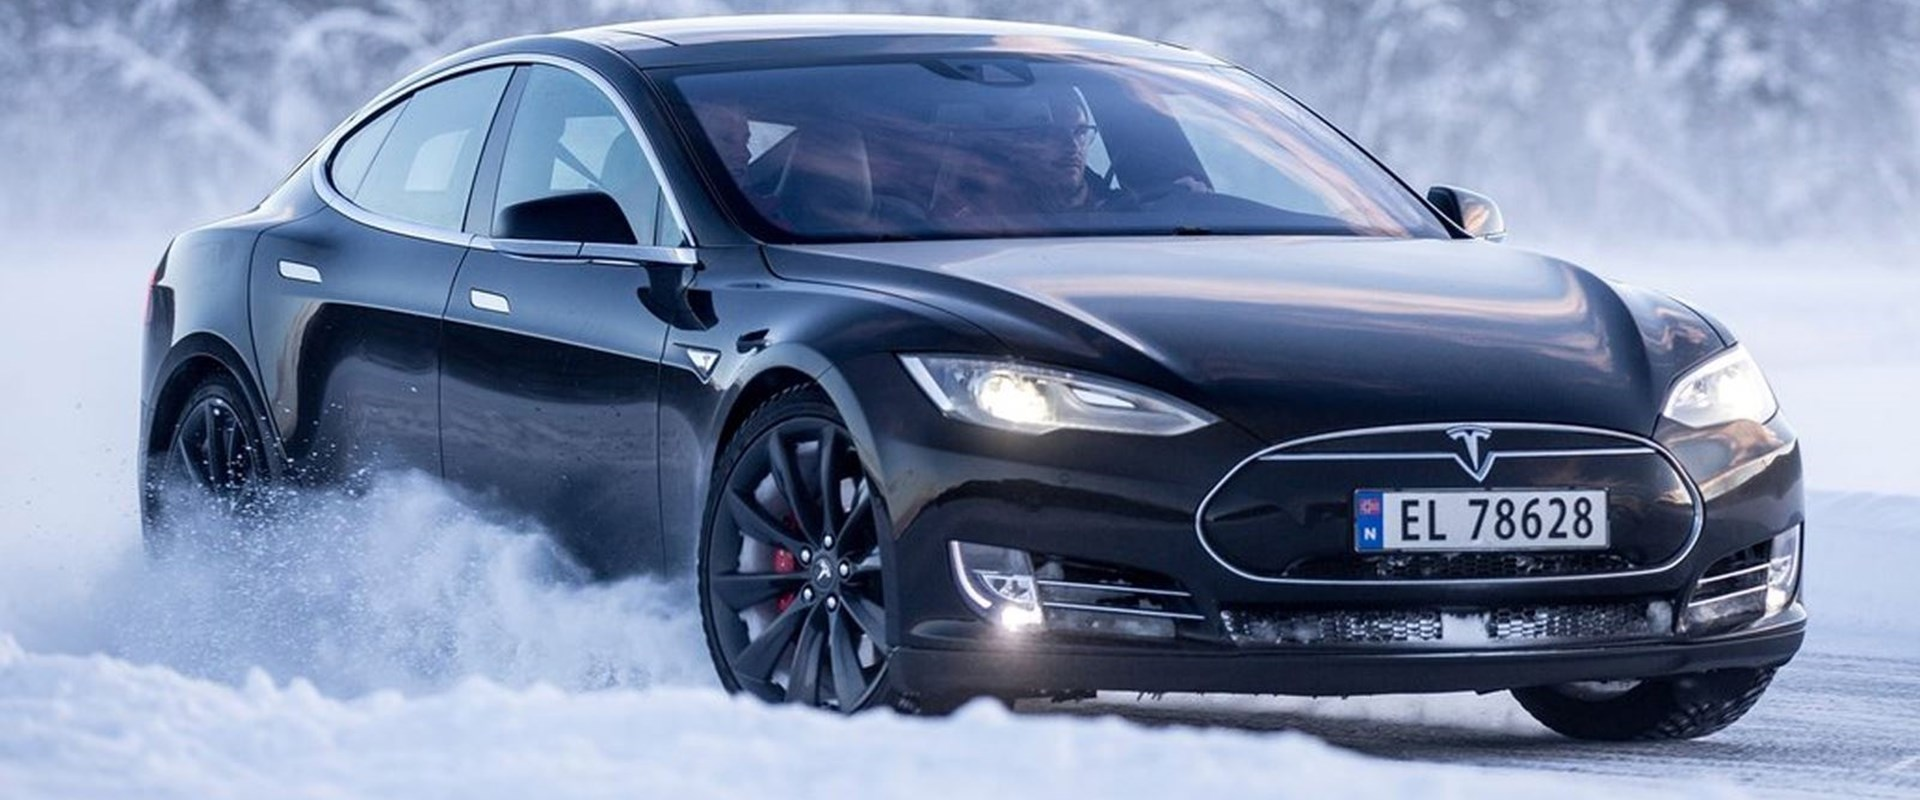 e-cars cyprus news